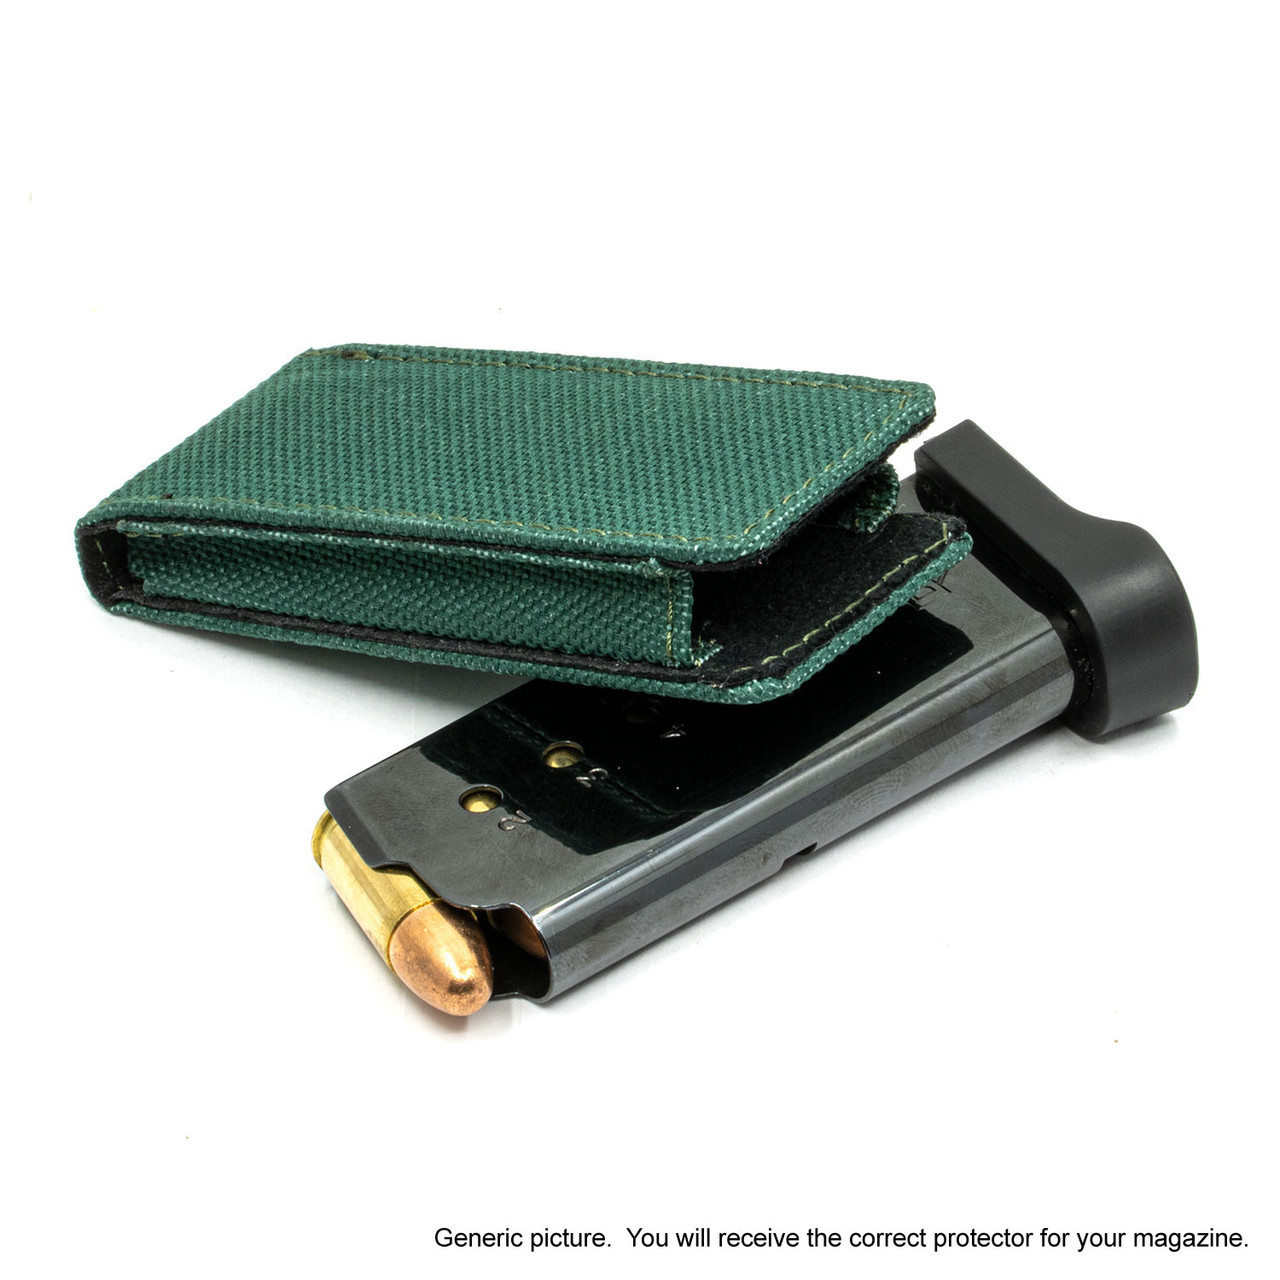 Colt Mark IV Series 80 (.380) Green Covert Magazine Pocket Protector